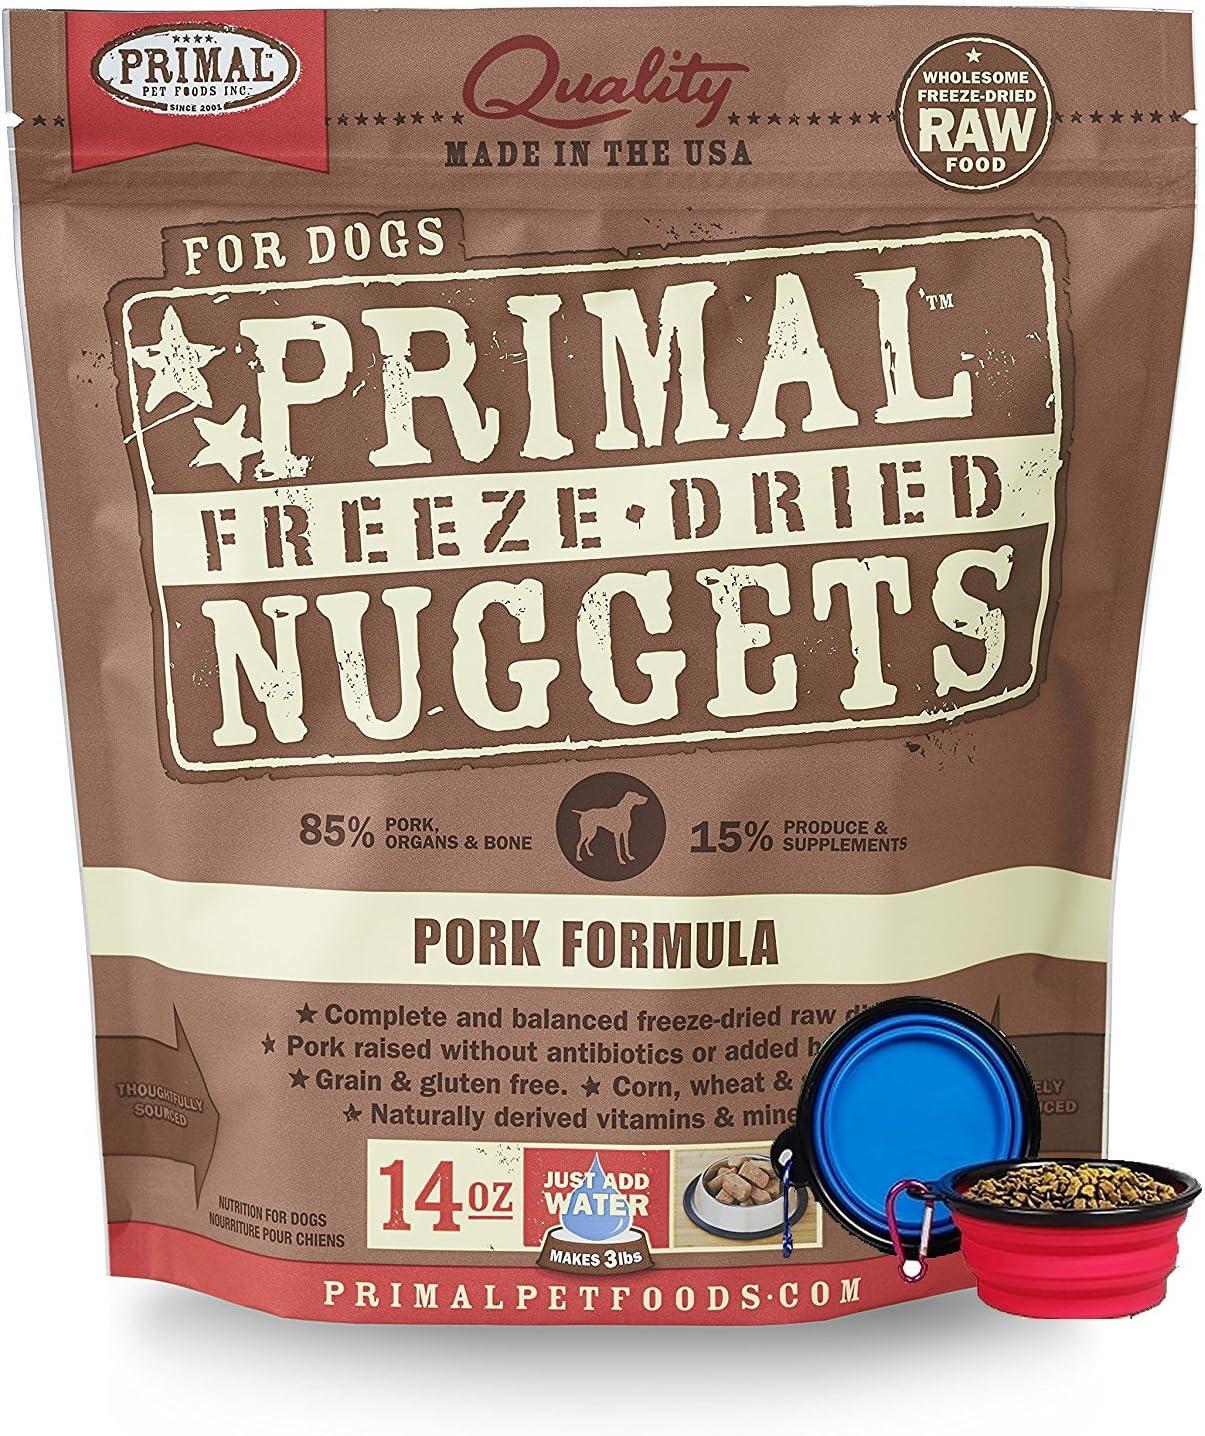 Primal Pet Food - Freeze Dried Dog Food 14-ounce Bag - Made in USA (Pork)